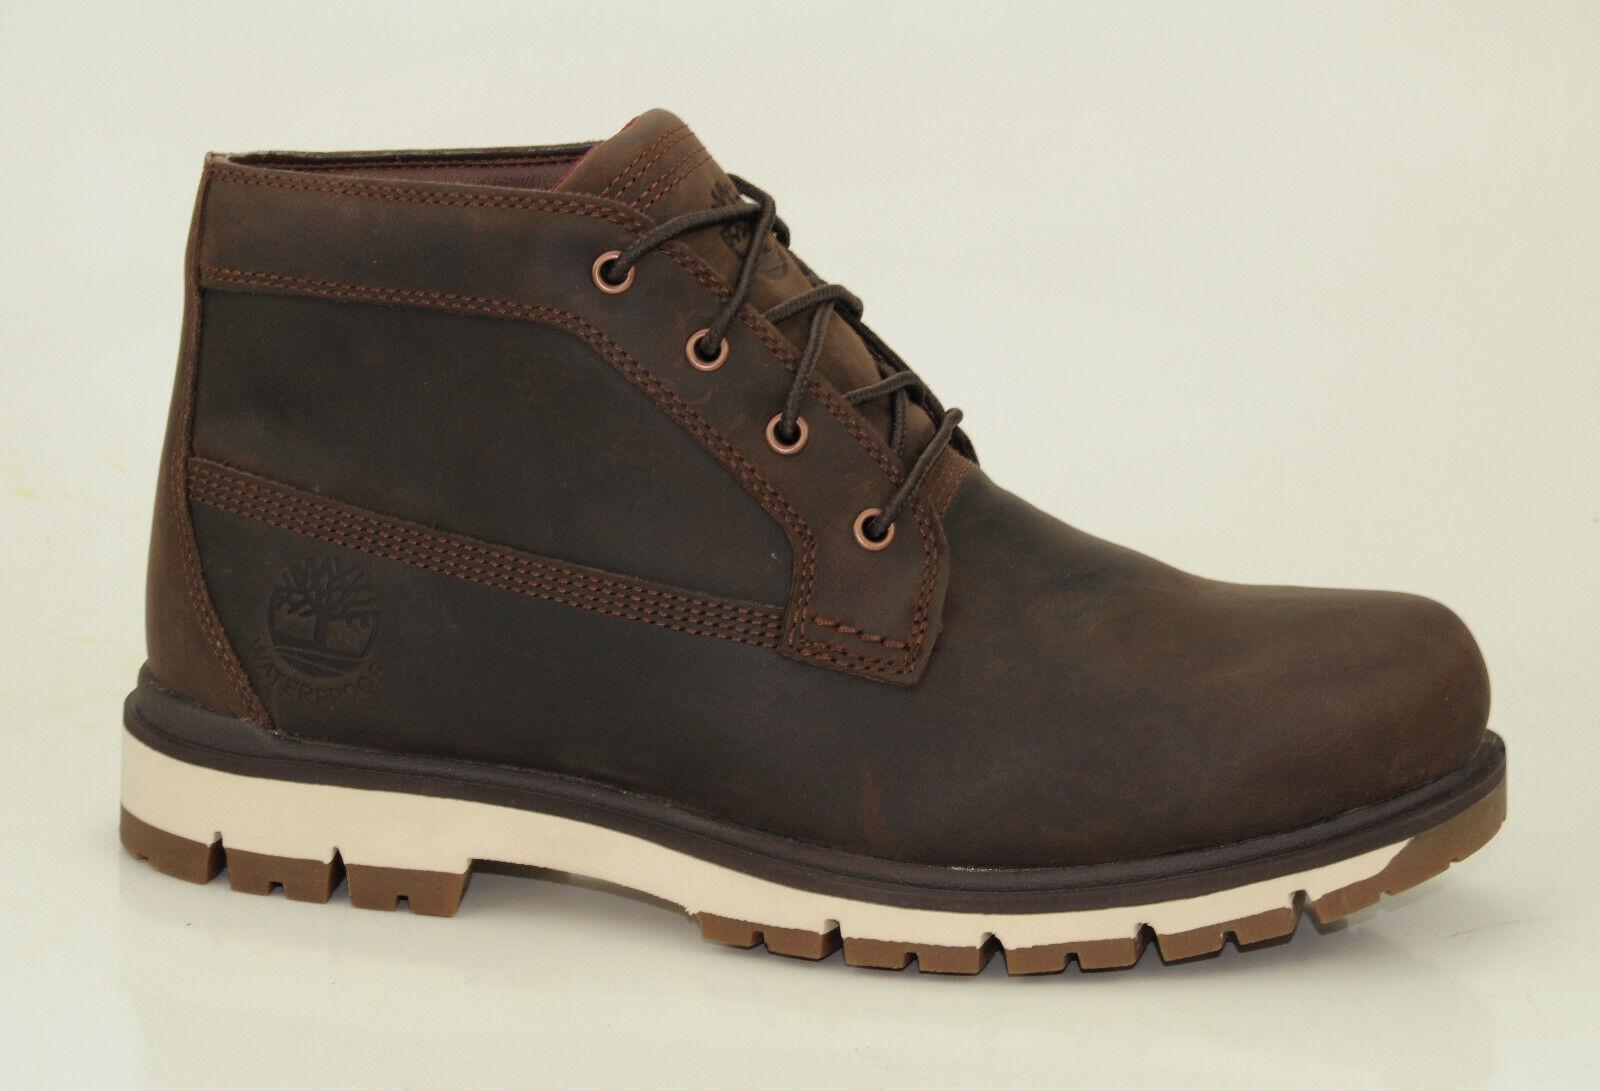 Timberland Radford Chukka Boots